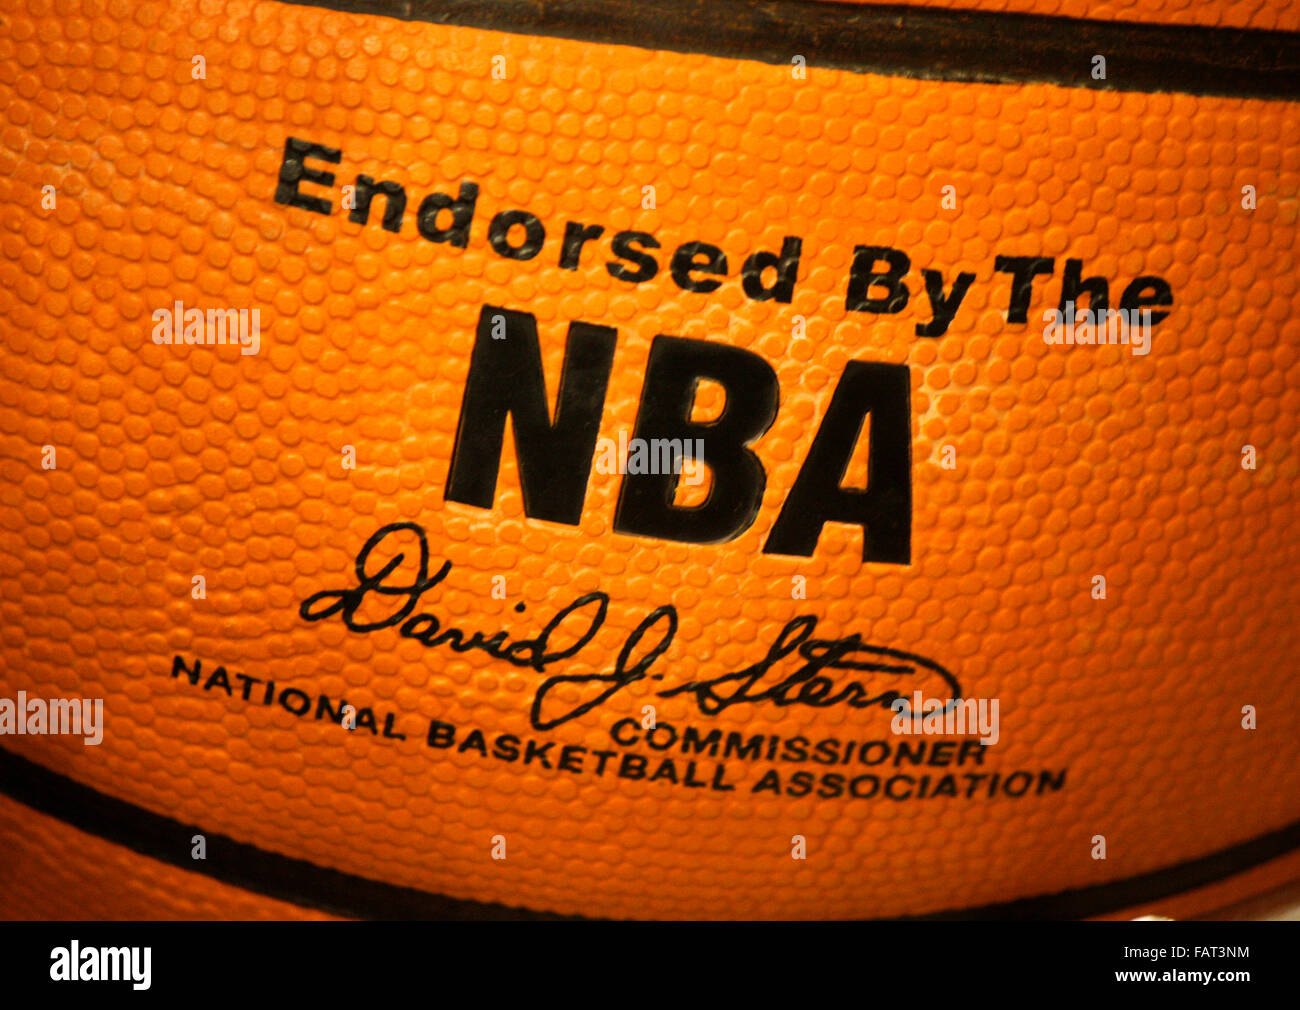 "Markenname: 'NBA National Basketball Association"", Berlin. Banque D'Images"